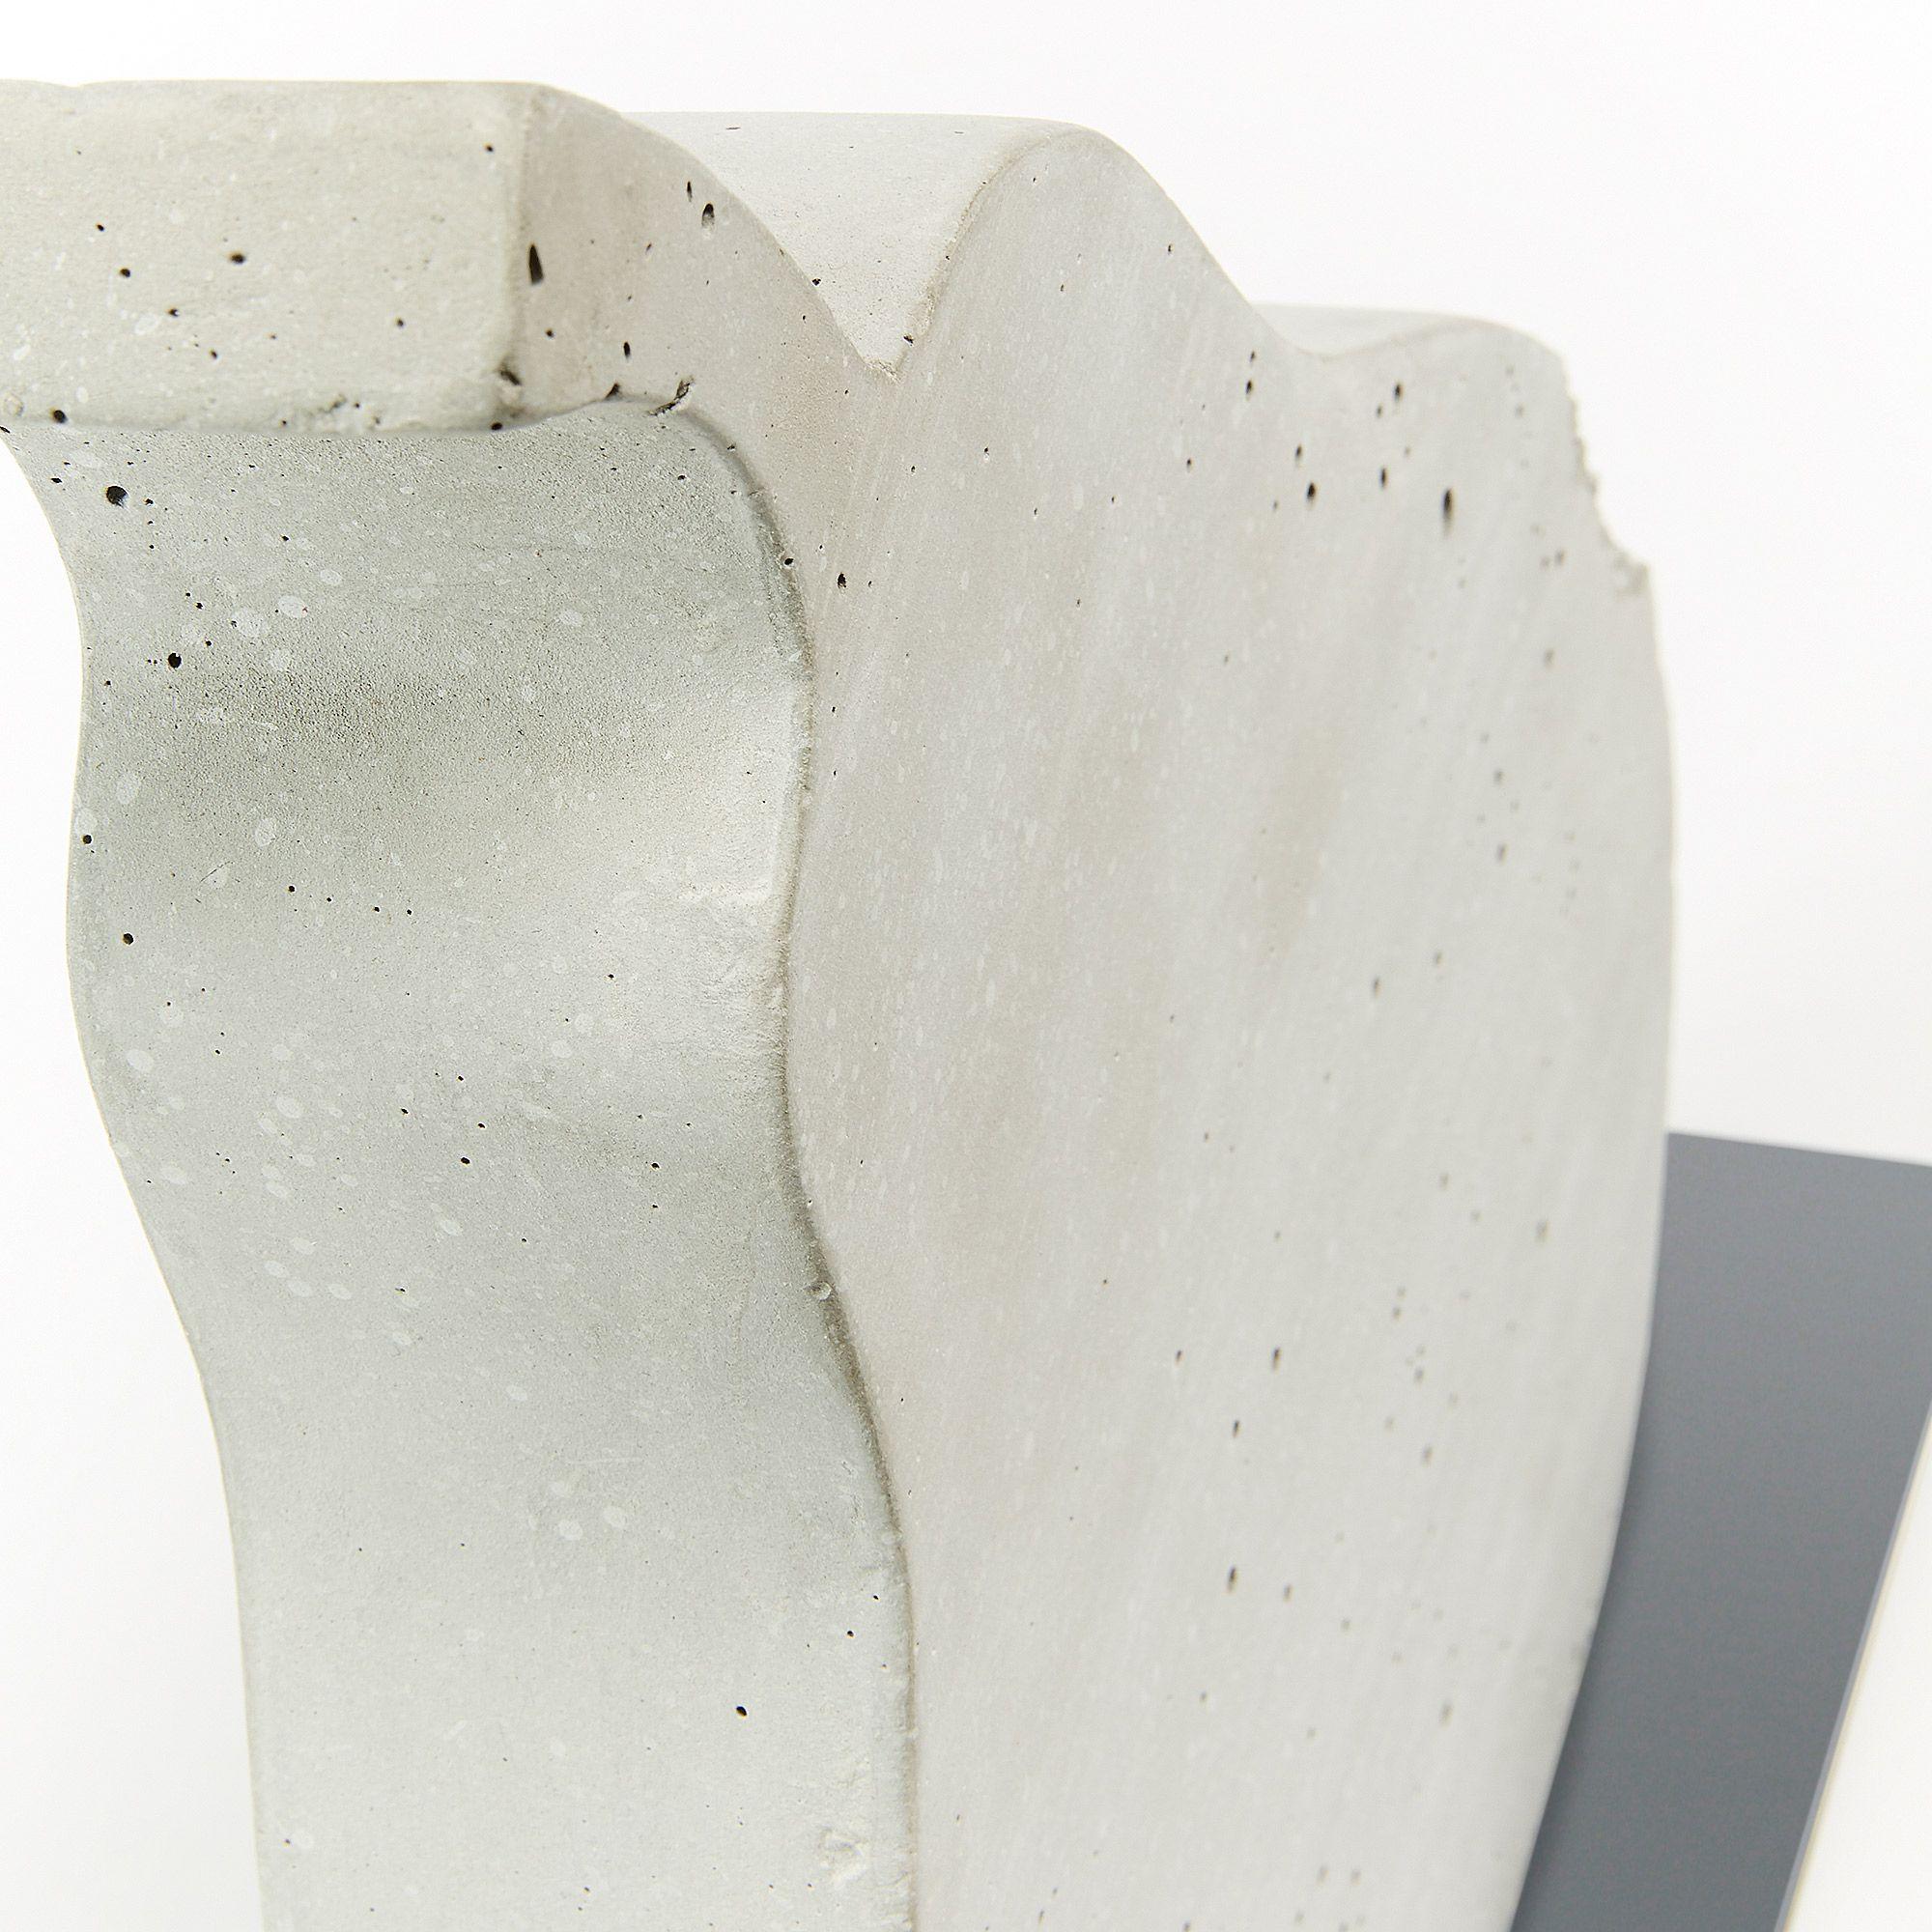 Kave Home Figura Decorativa Szar Pera En Cemento Blanco